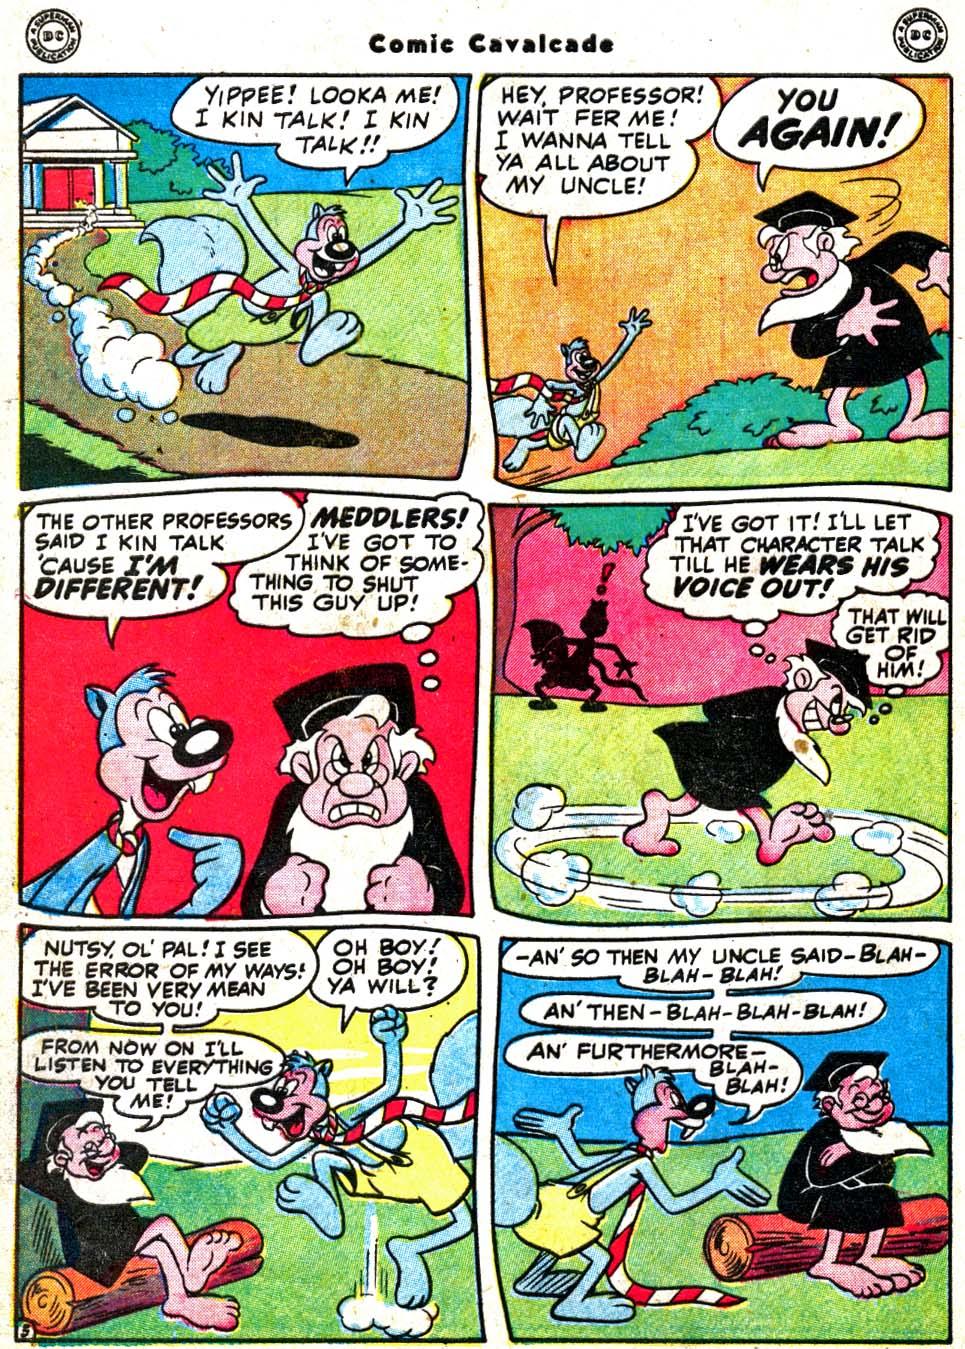 Comic Cavalcade issue 31 - Page 40